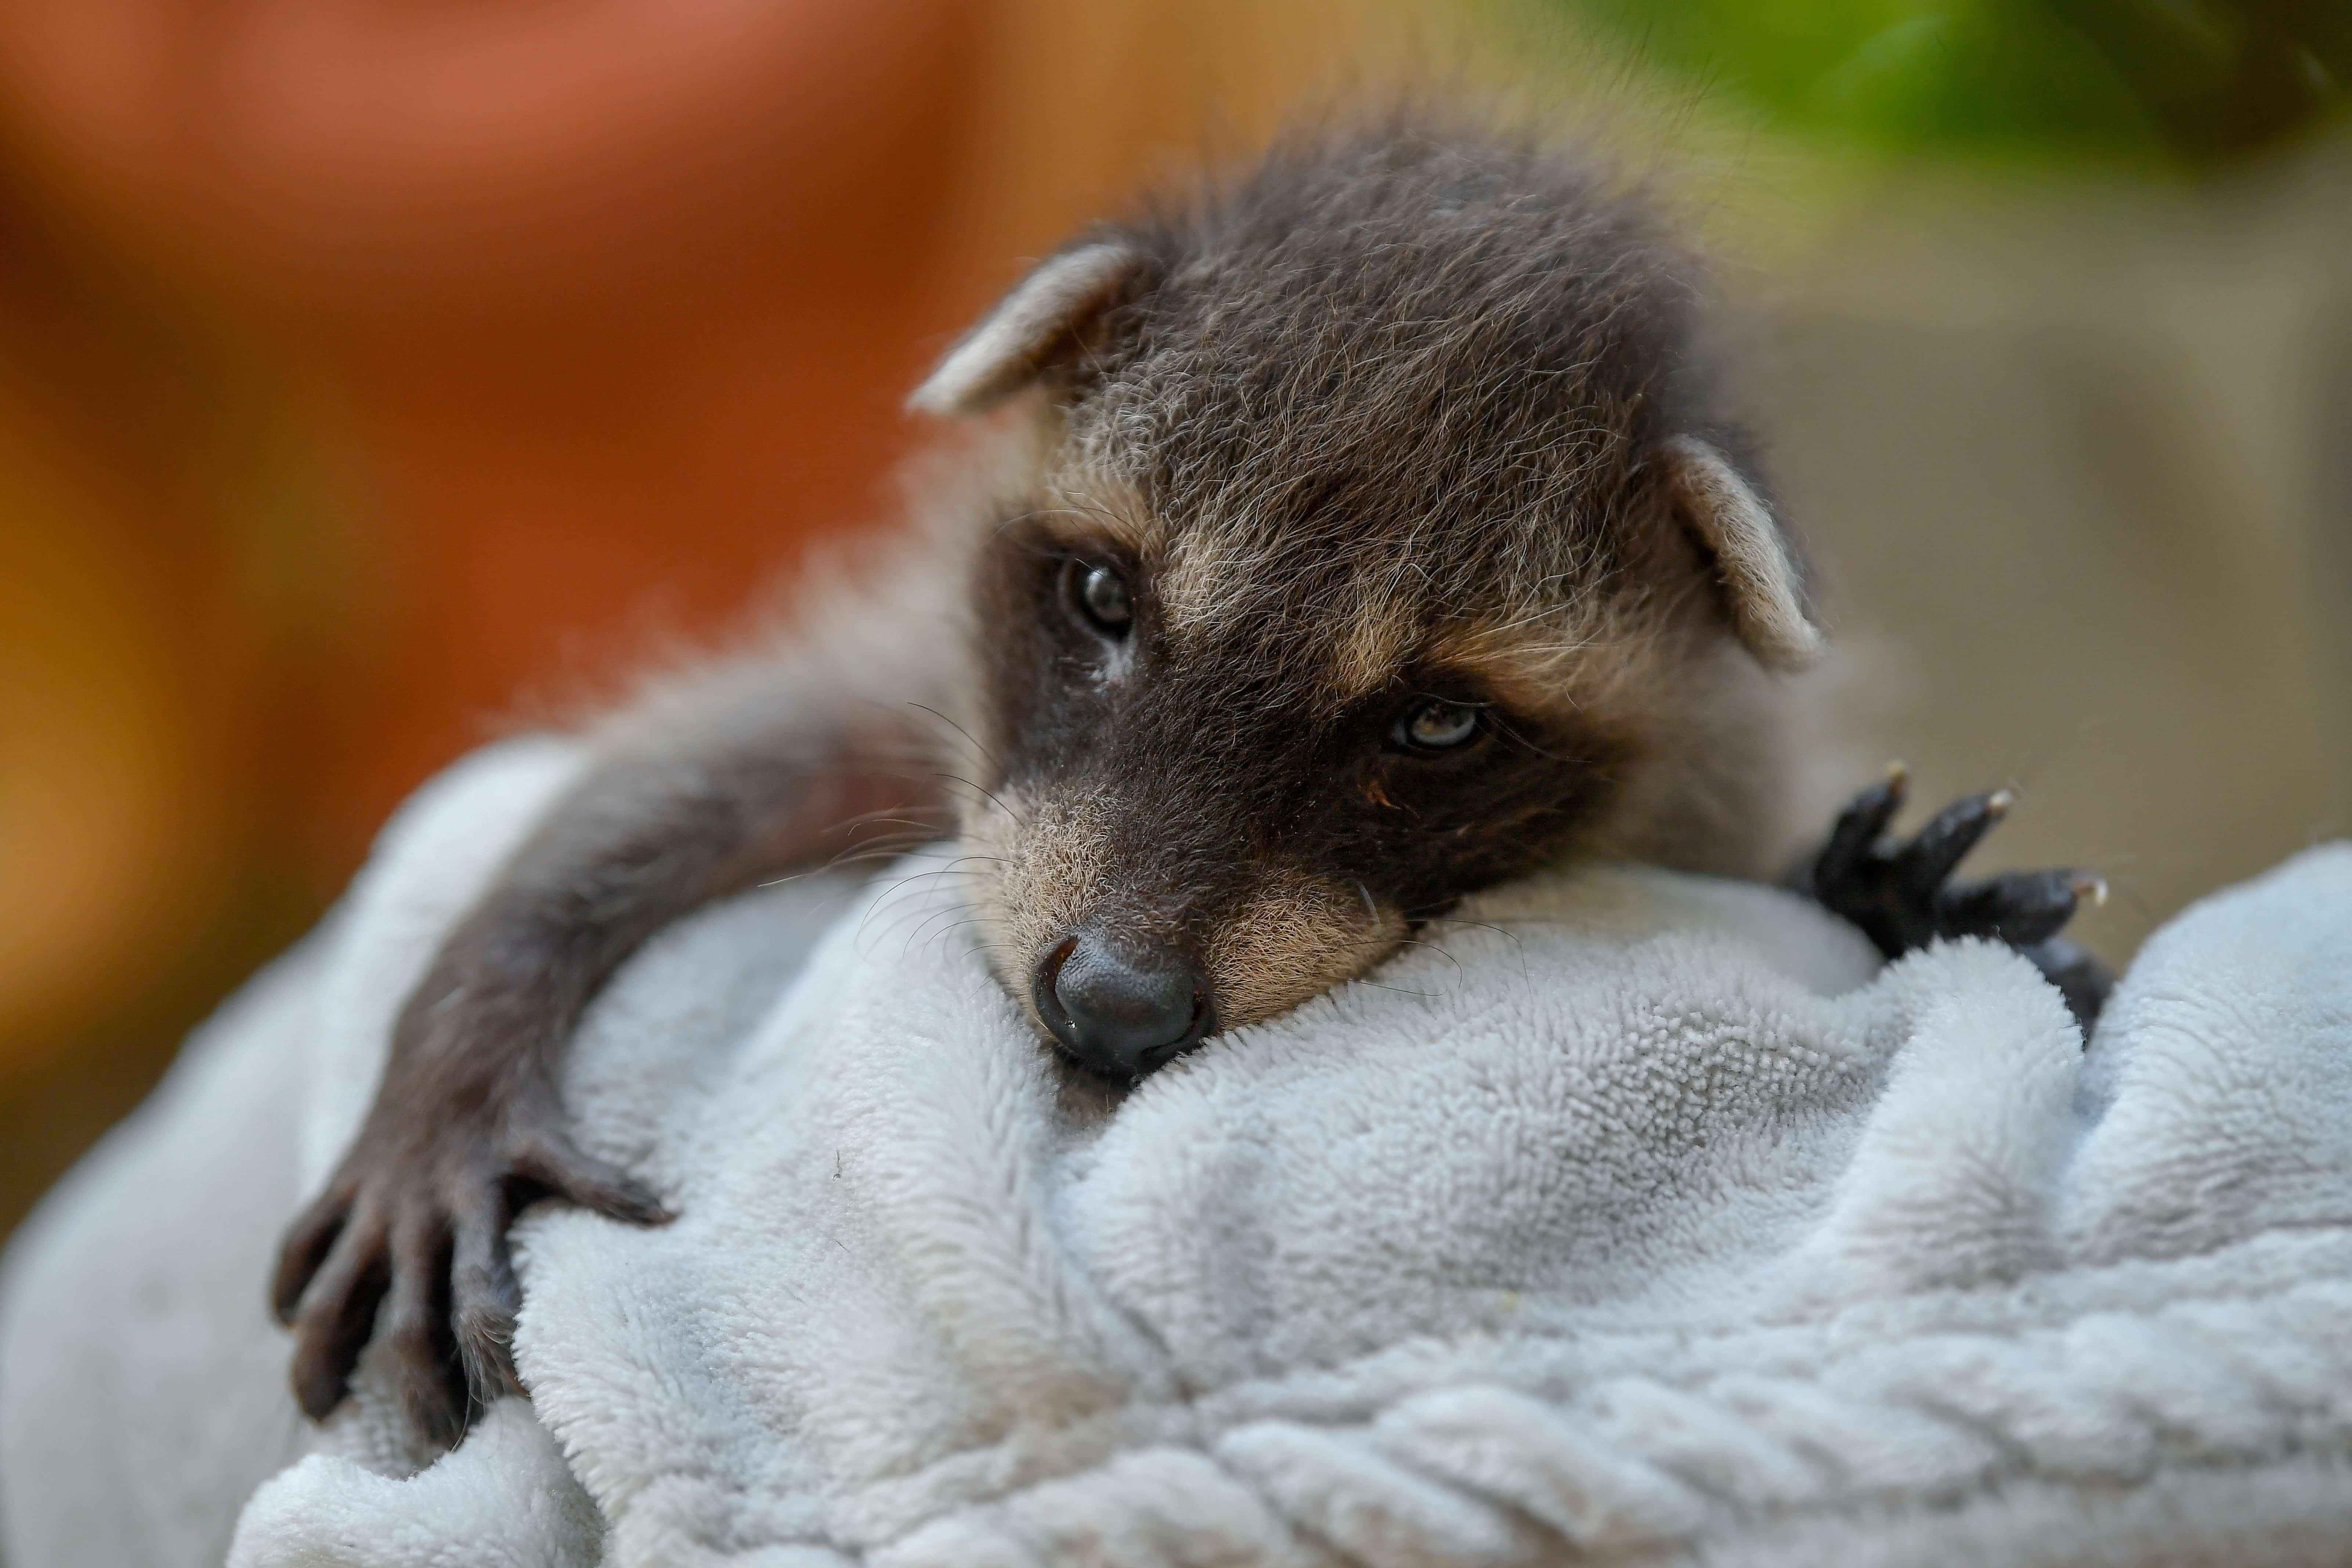 Daily cute - Newborn raccoon at the Debrecen Zoo